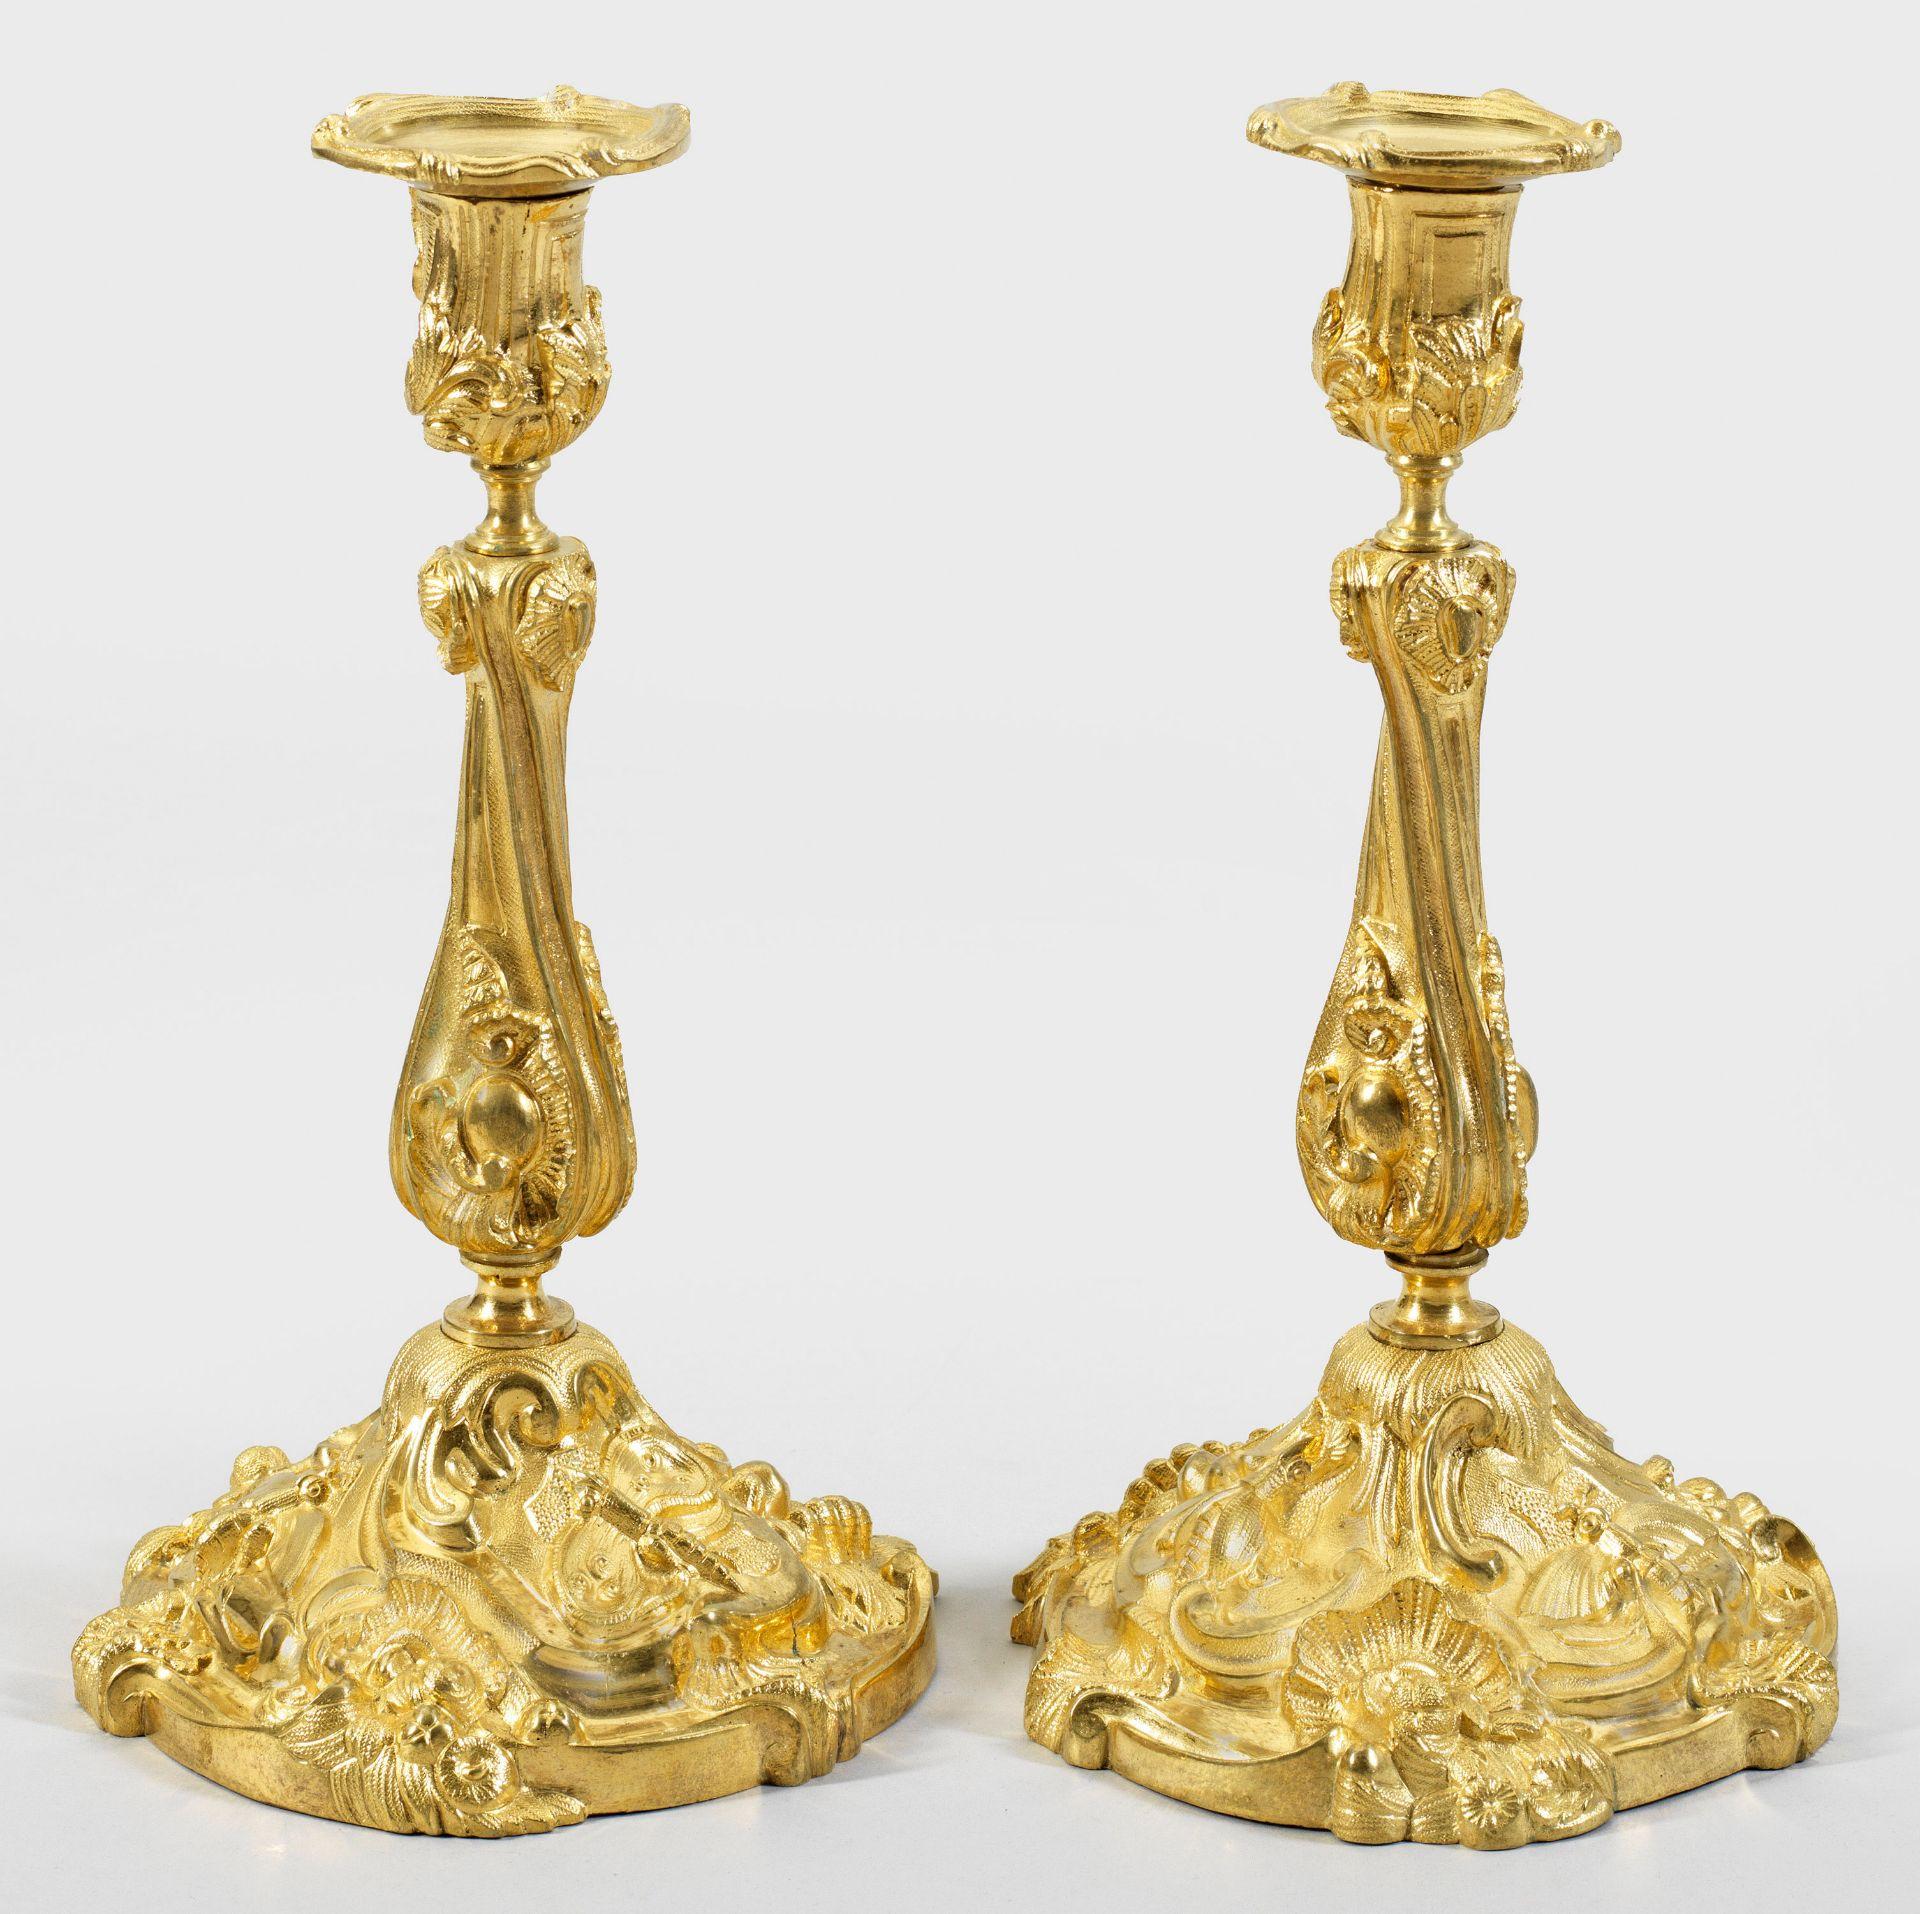 Paar Tafelleuchter im Louis XV-Stil